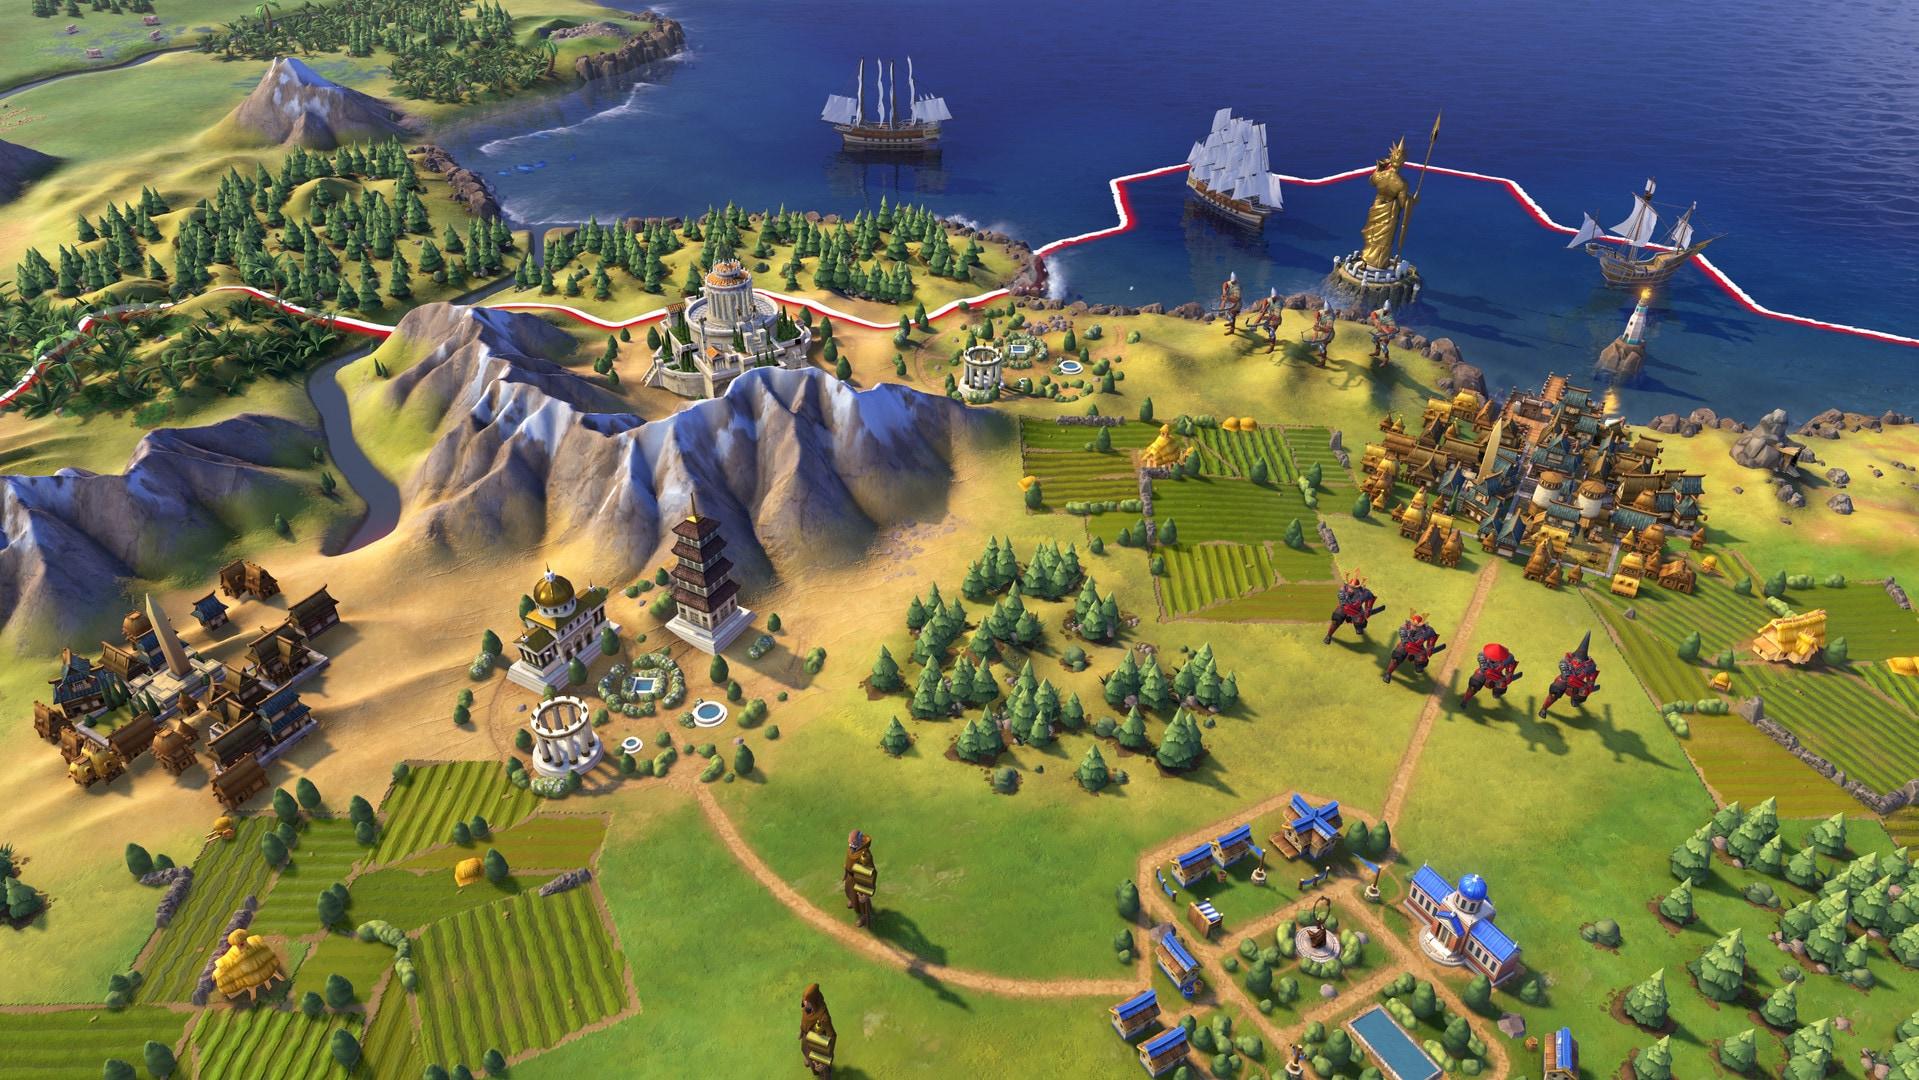 Sid Meier's Civilization VI Steam Key RU/CIS - 4